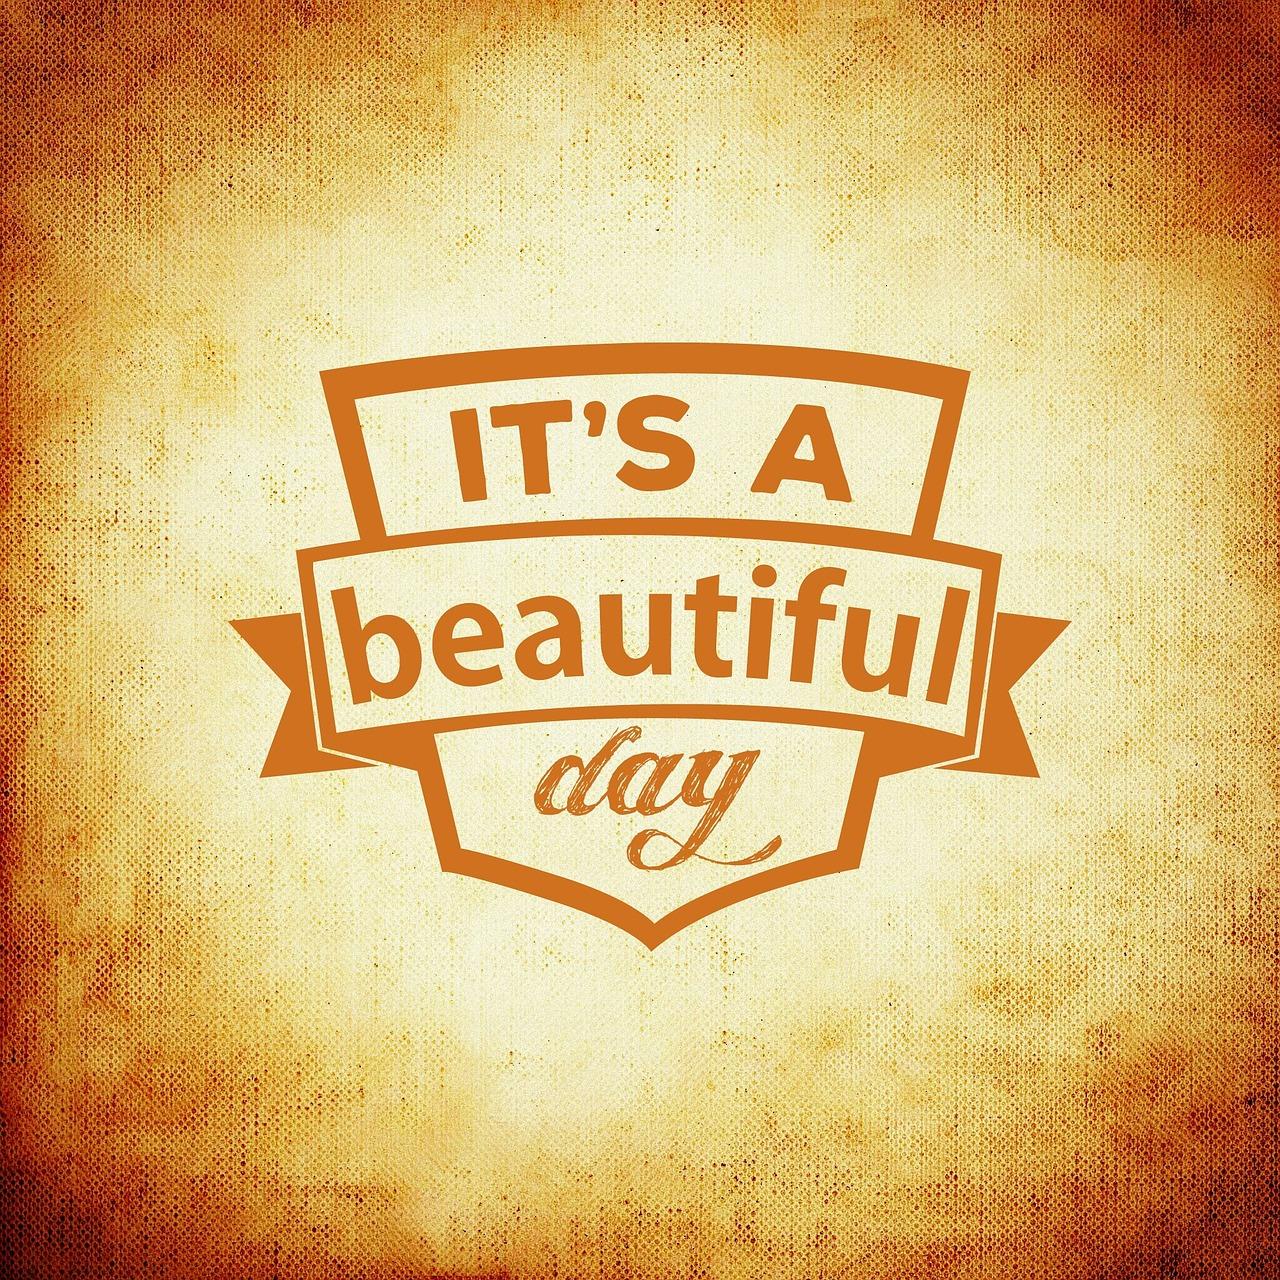 Happy International beauty day!